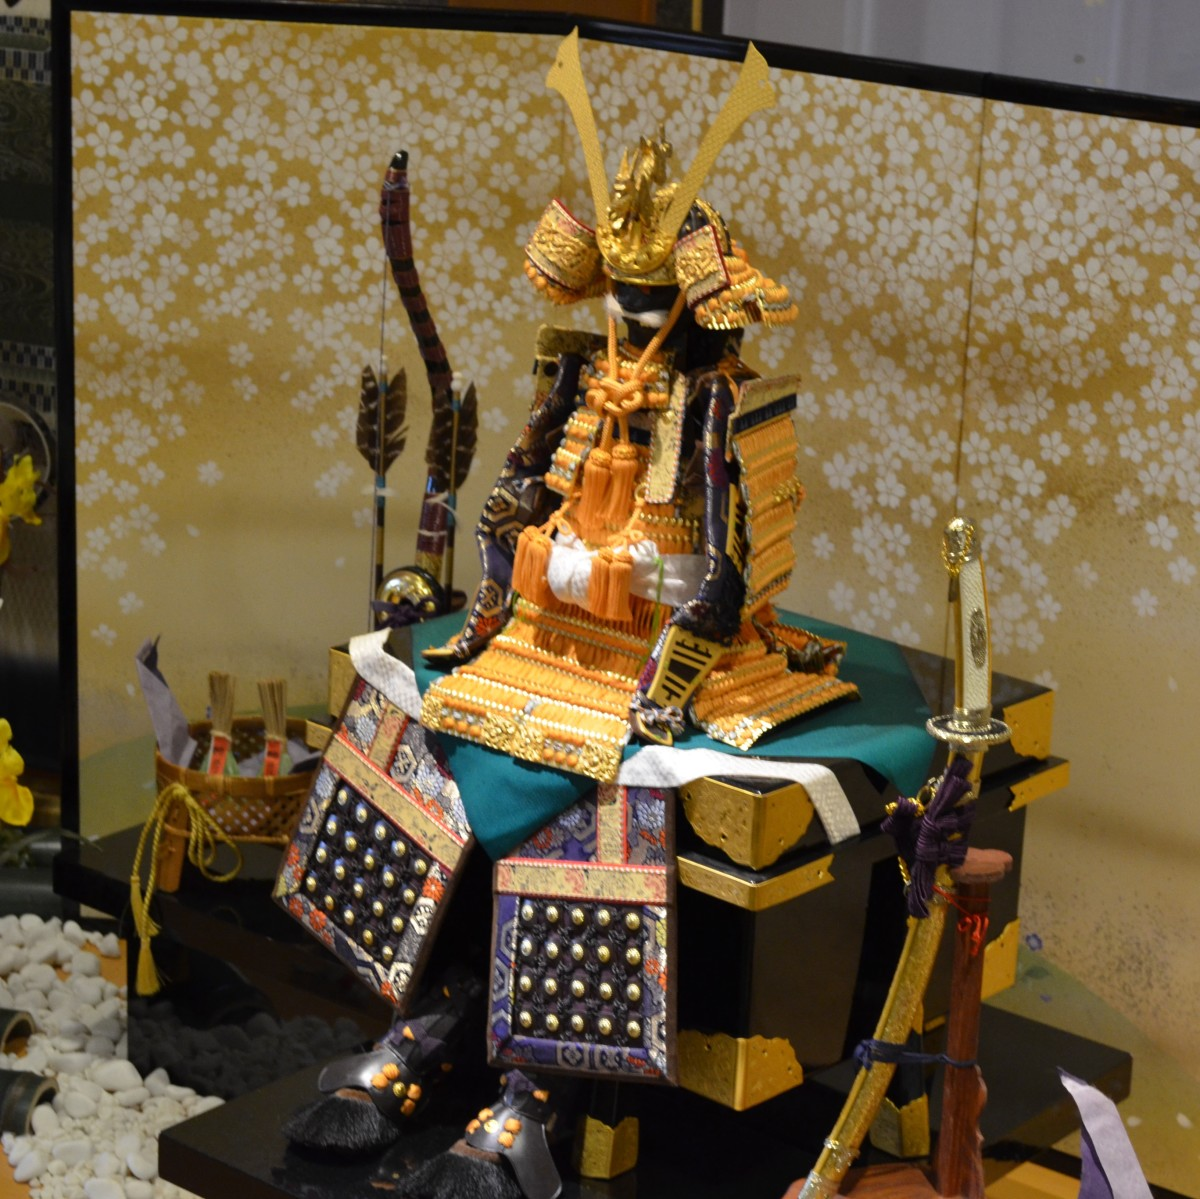 Samurai warrior display in Arima, Japan